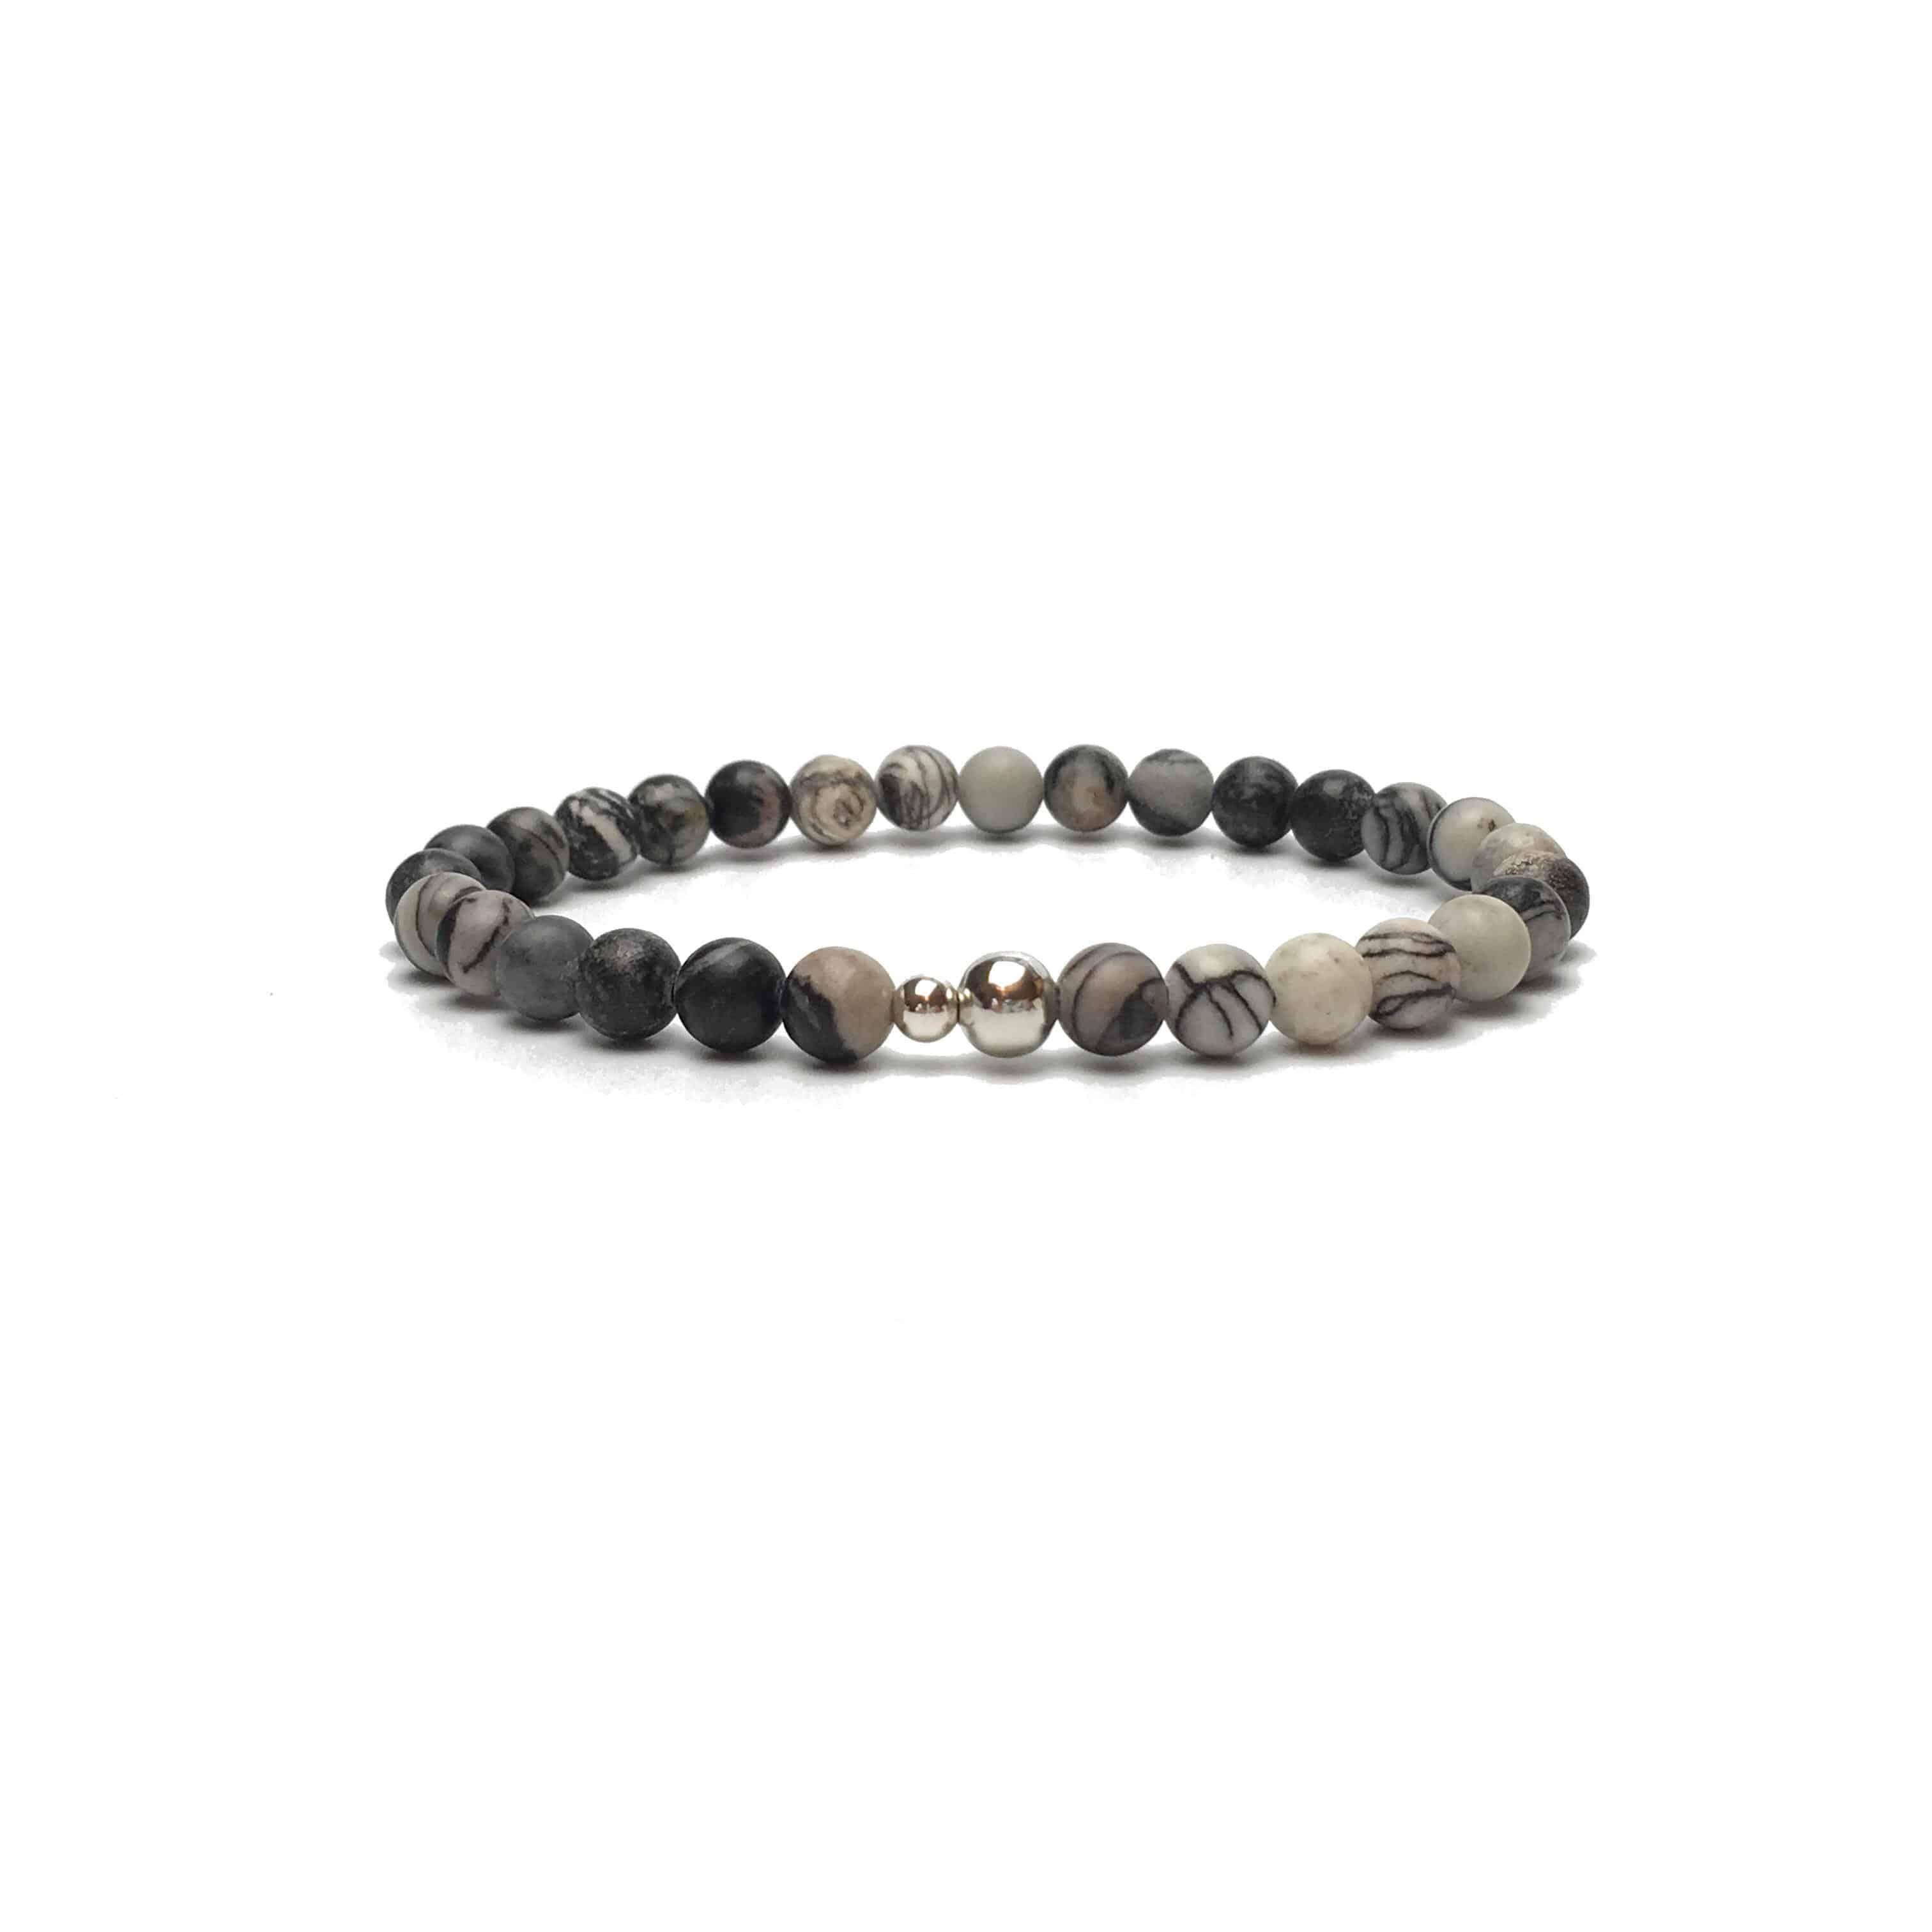 6mm Zebra Stone and Sterling Silver Bead Bracelet